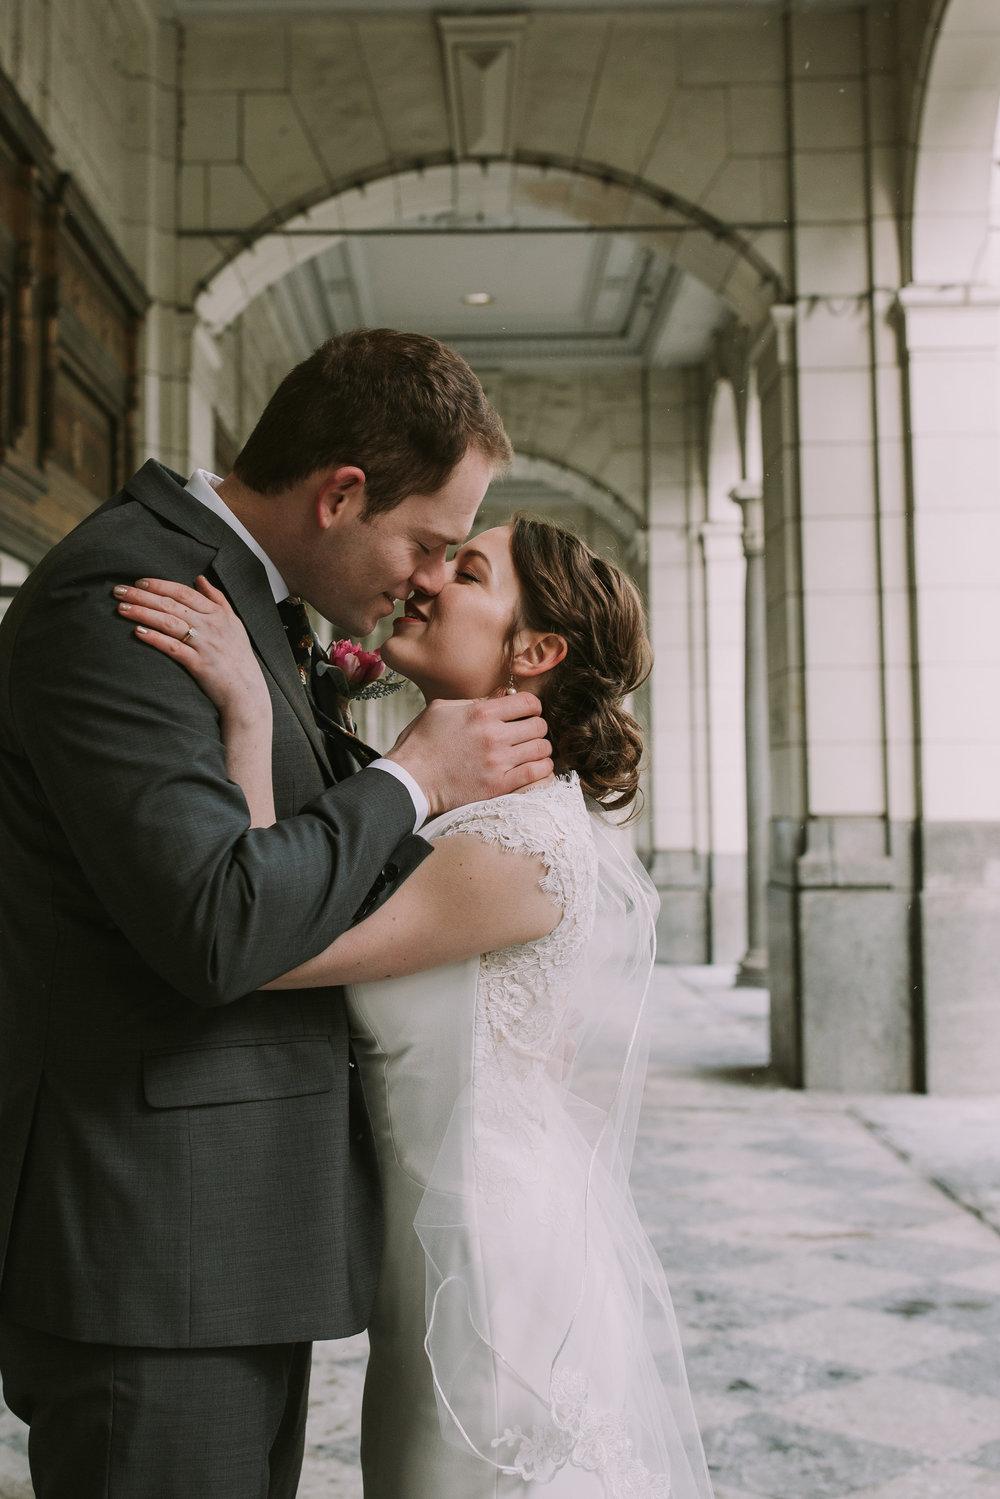 paige and alan 's wedding    hudson's bay calgary & stephen avenue calgary, canada